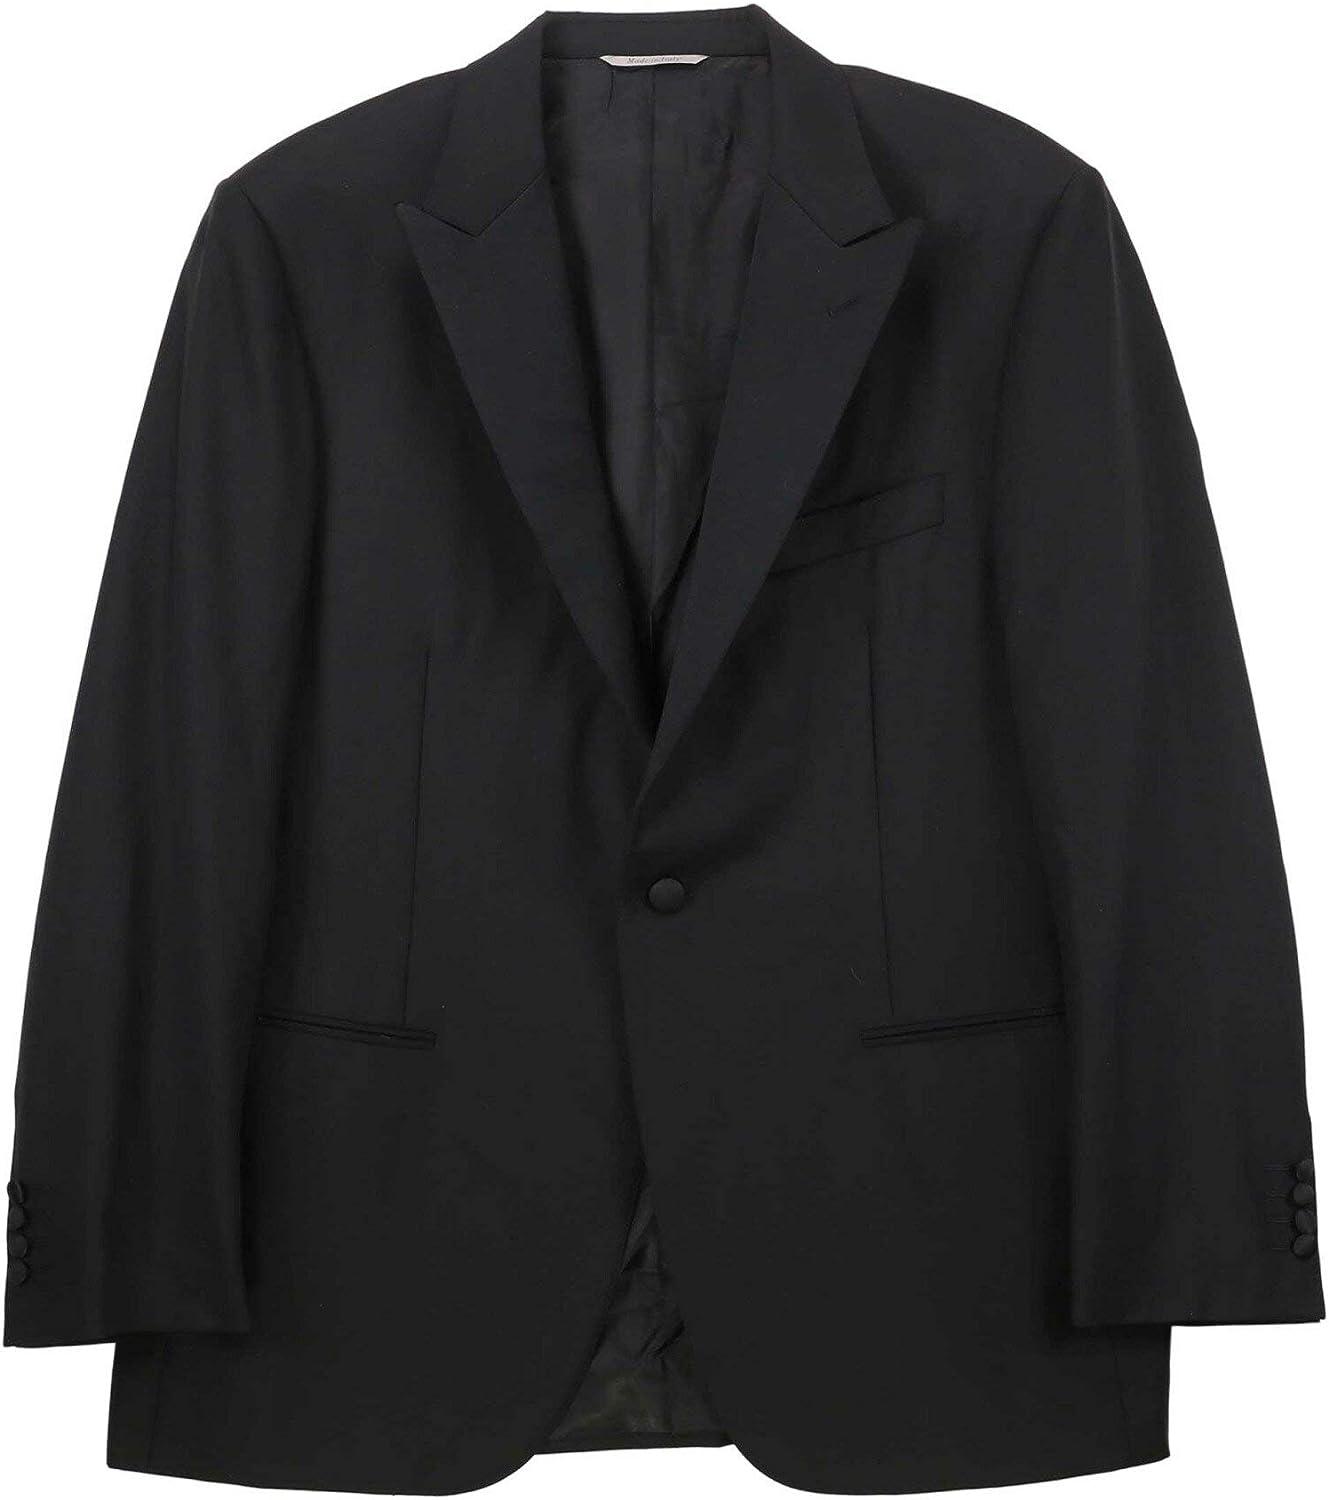 Canali Men's Black Elegant Wool Tuxedo with Silk Peak Lapels Suit - 38 Short